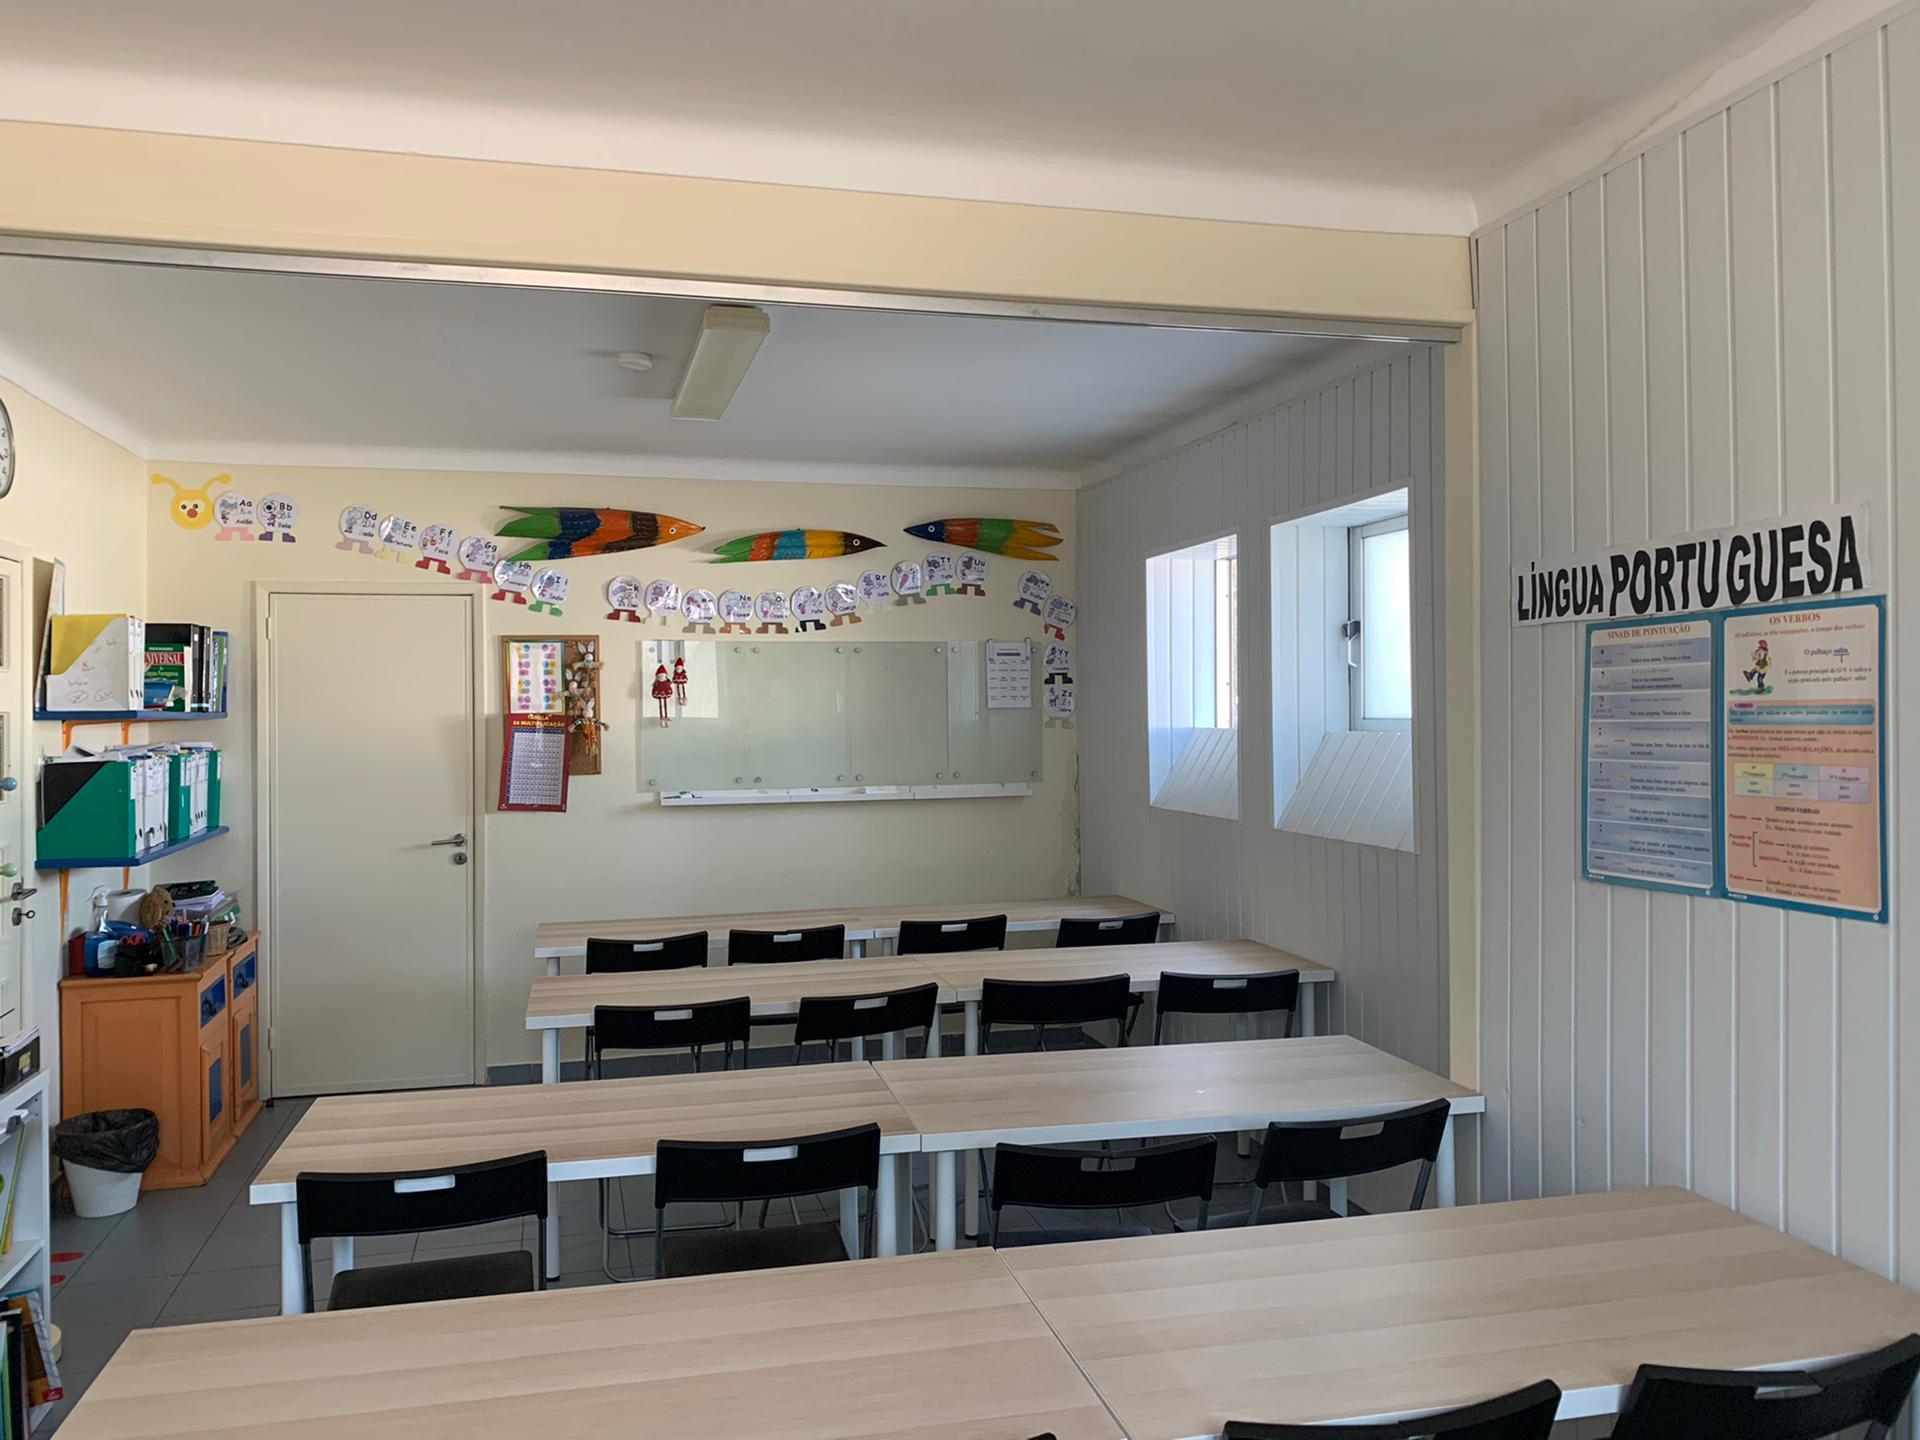 Confinamento: Salas de estudos vazias durante 6 meses